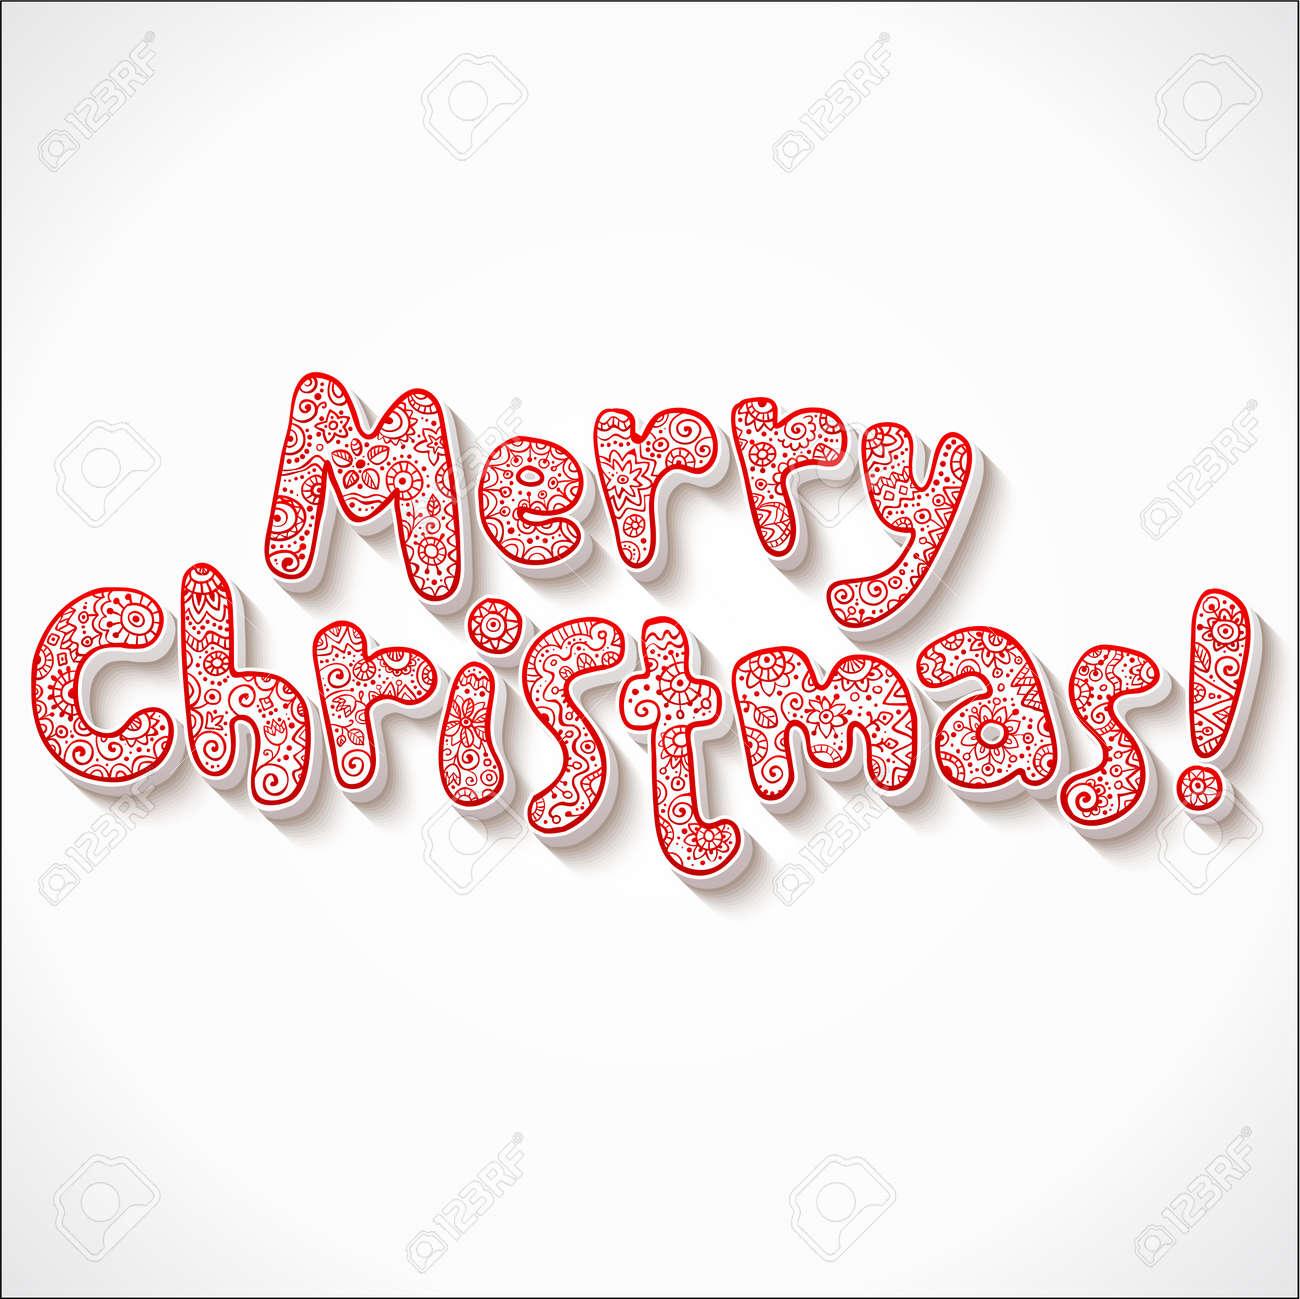 Hand lettering ornate Merry Christmas sign Stock Vector - 16296129